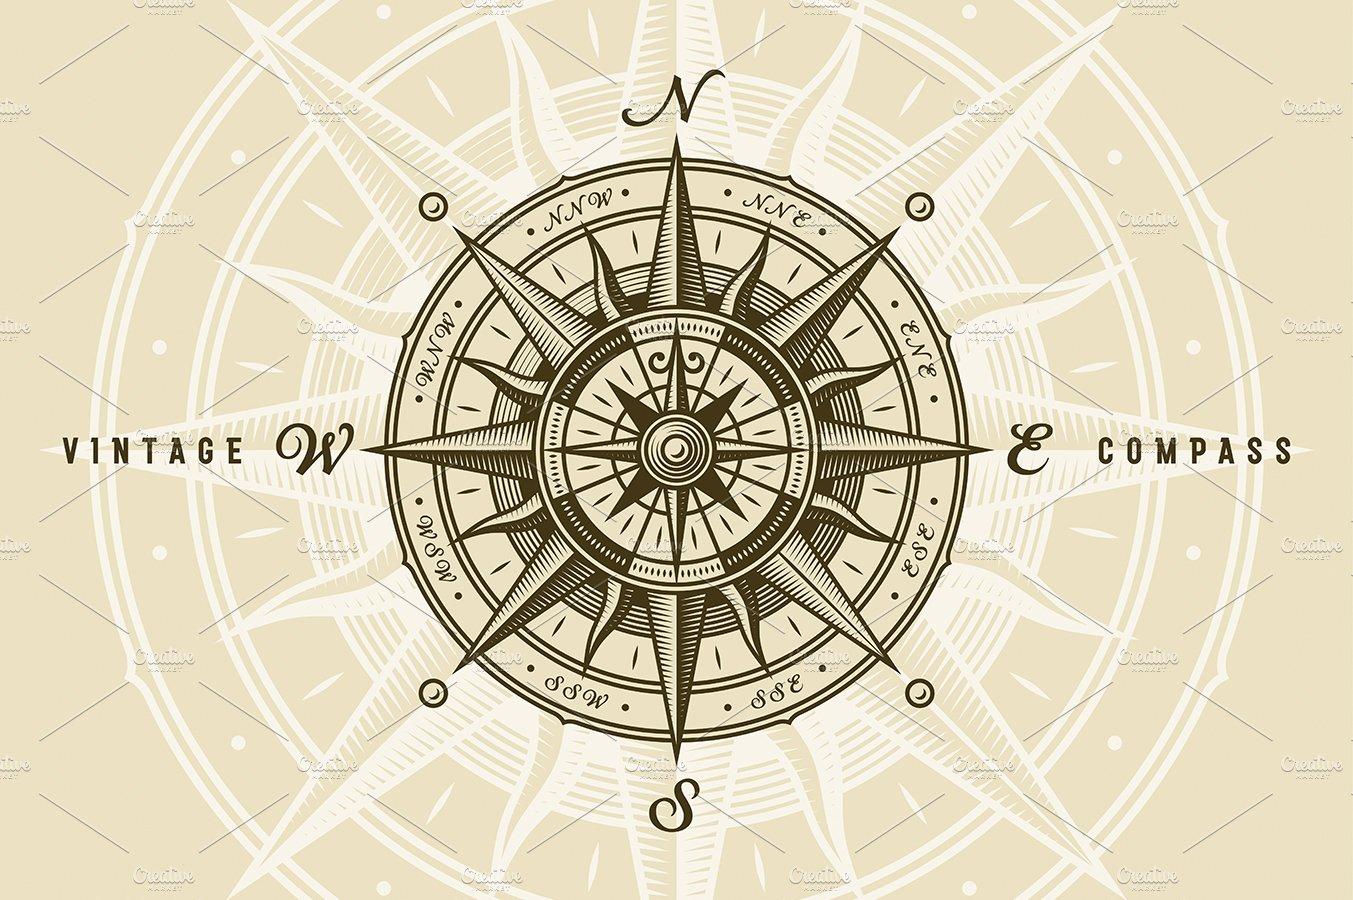 Vintage Nautical Compass Rose Illustrations Creative